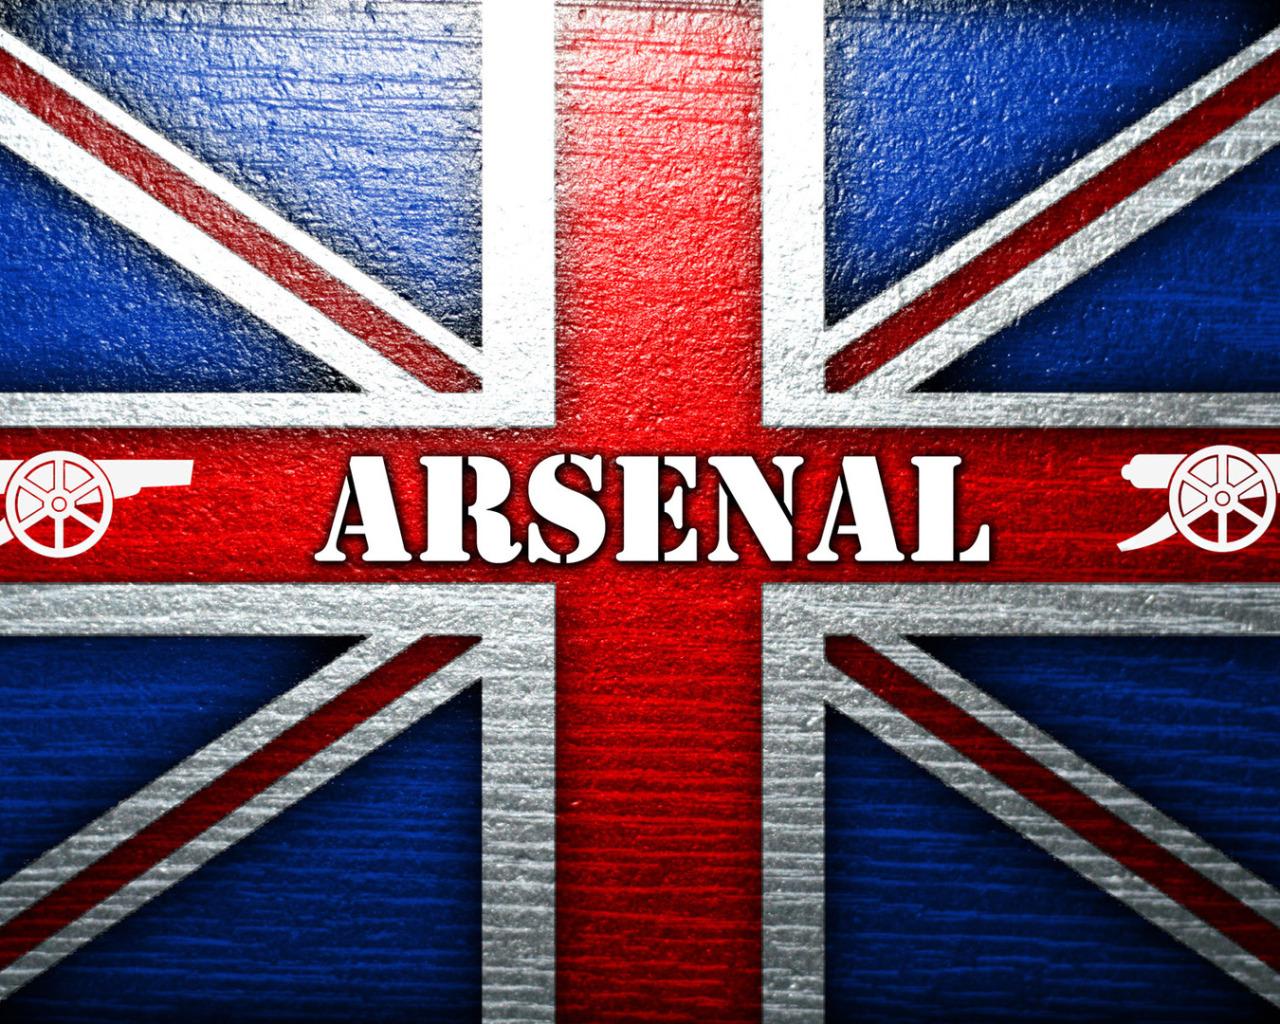 Mesut Ozil Wallpapers Hd Arsenal Arsenal Wallpapers Hd Pixelstalk Net